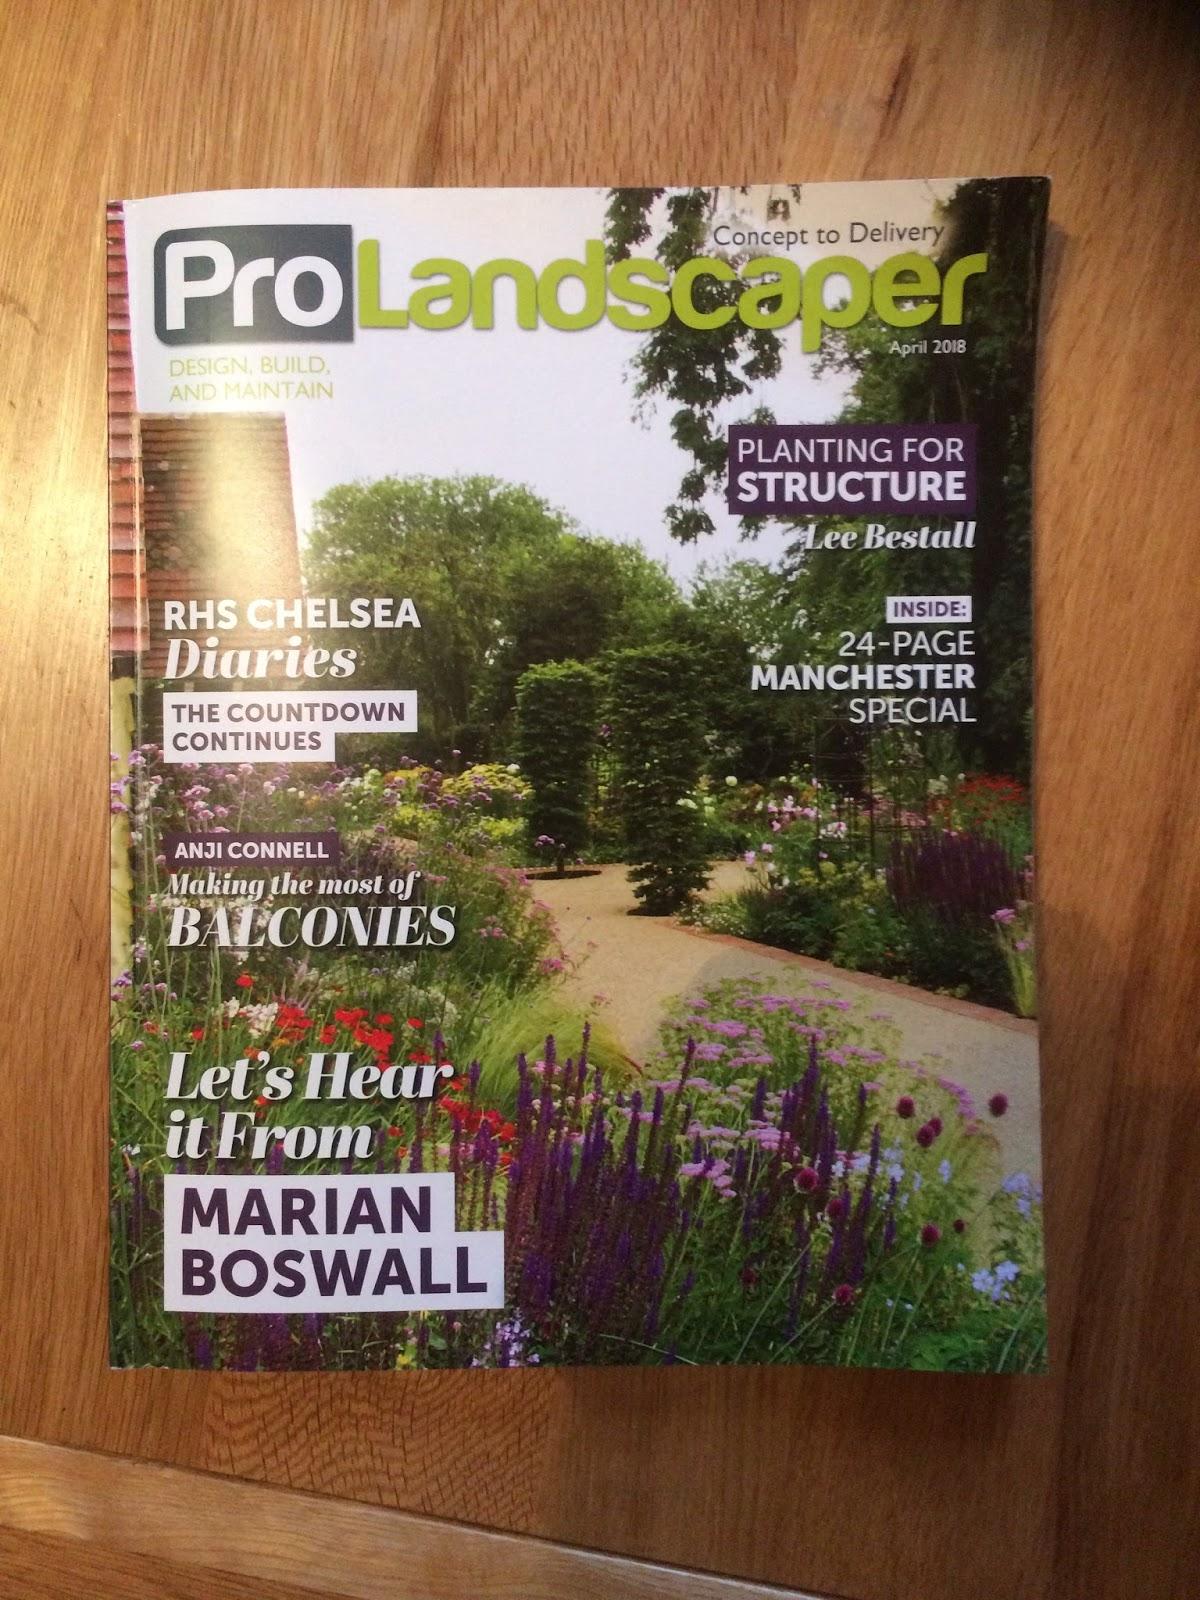 David Keegans Garden Design Blog